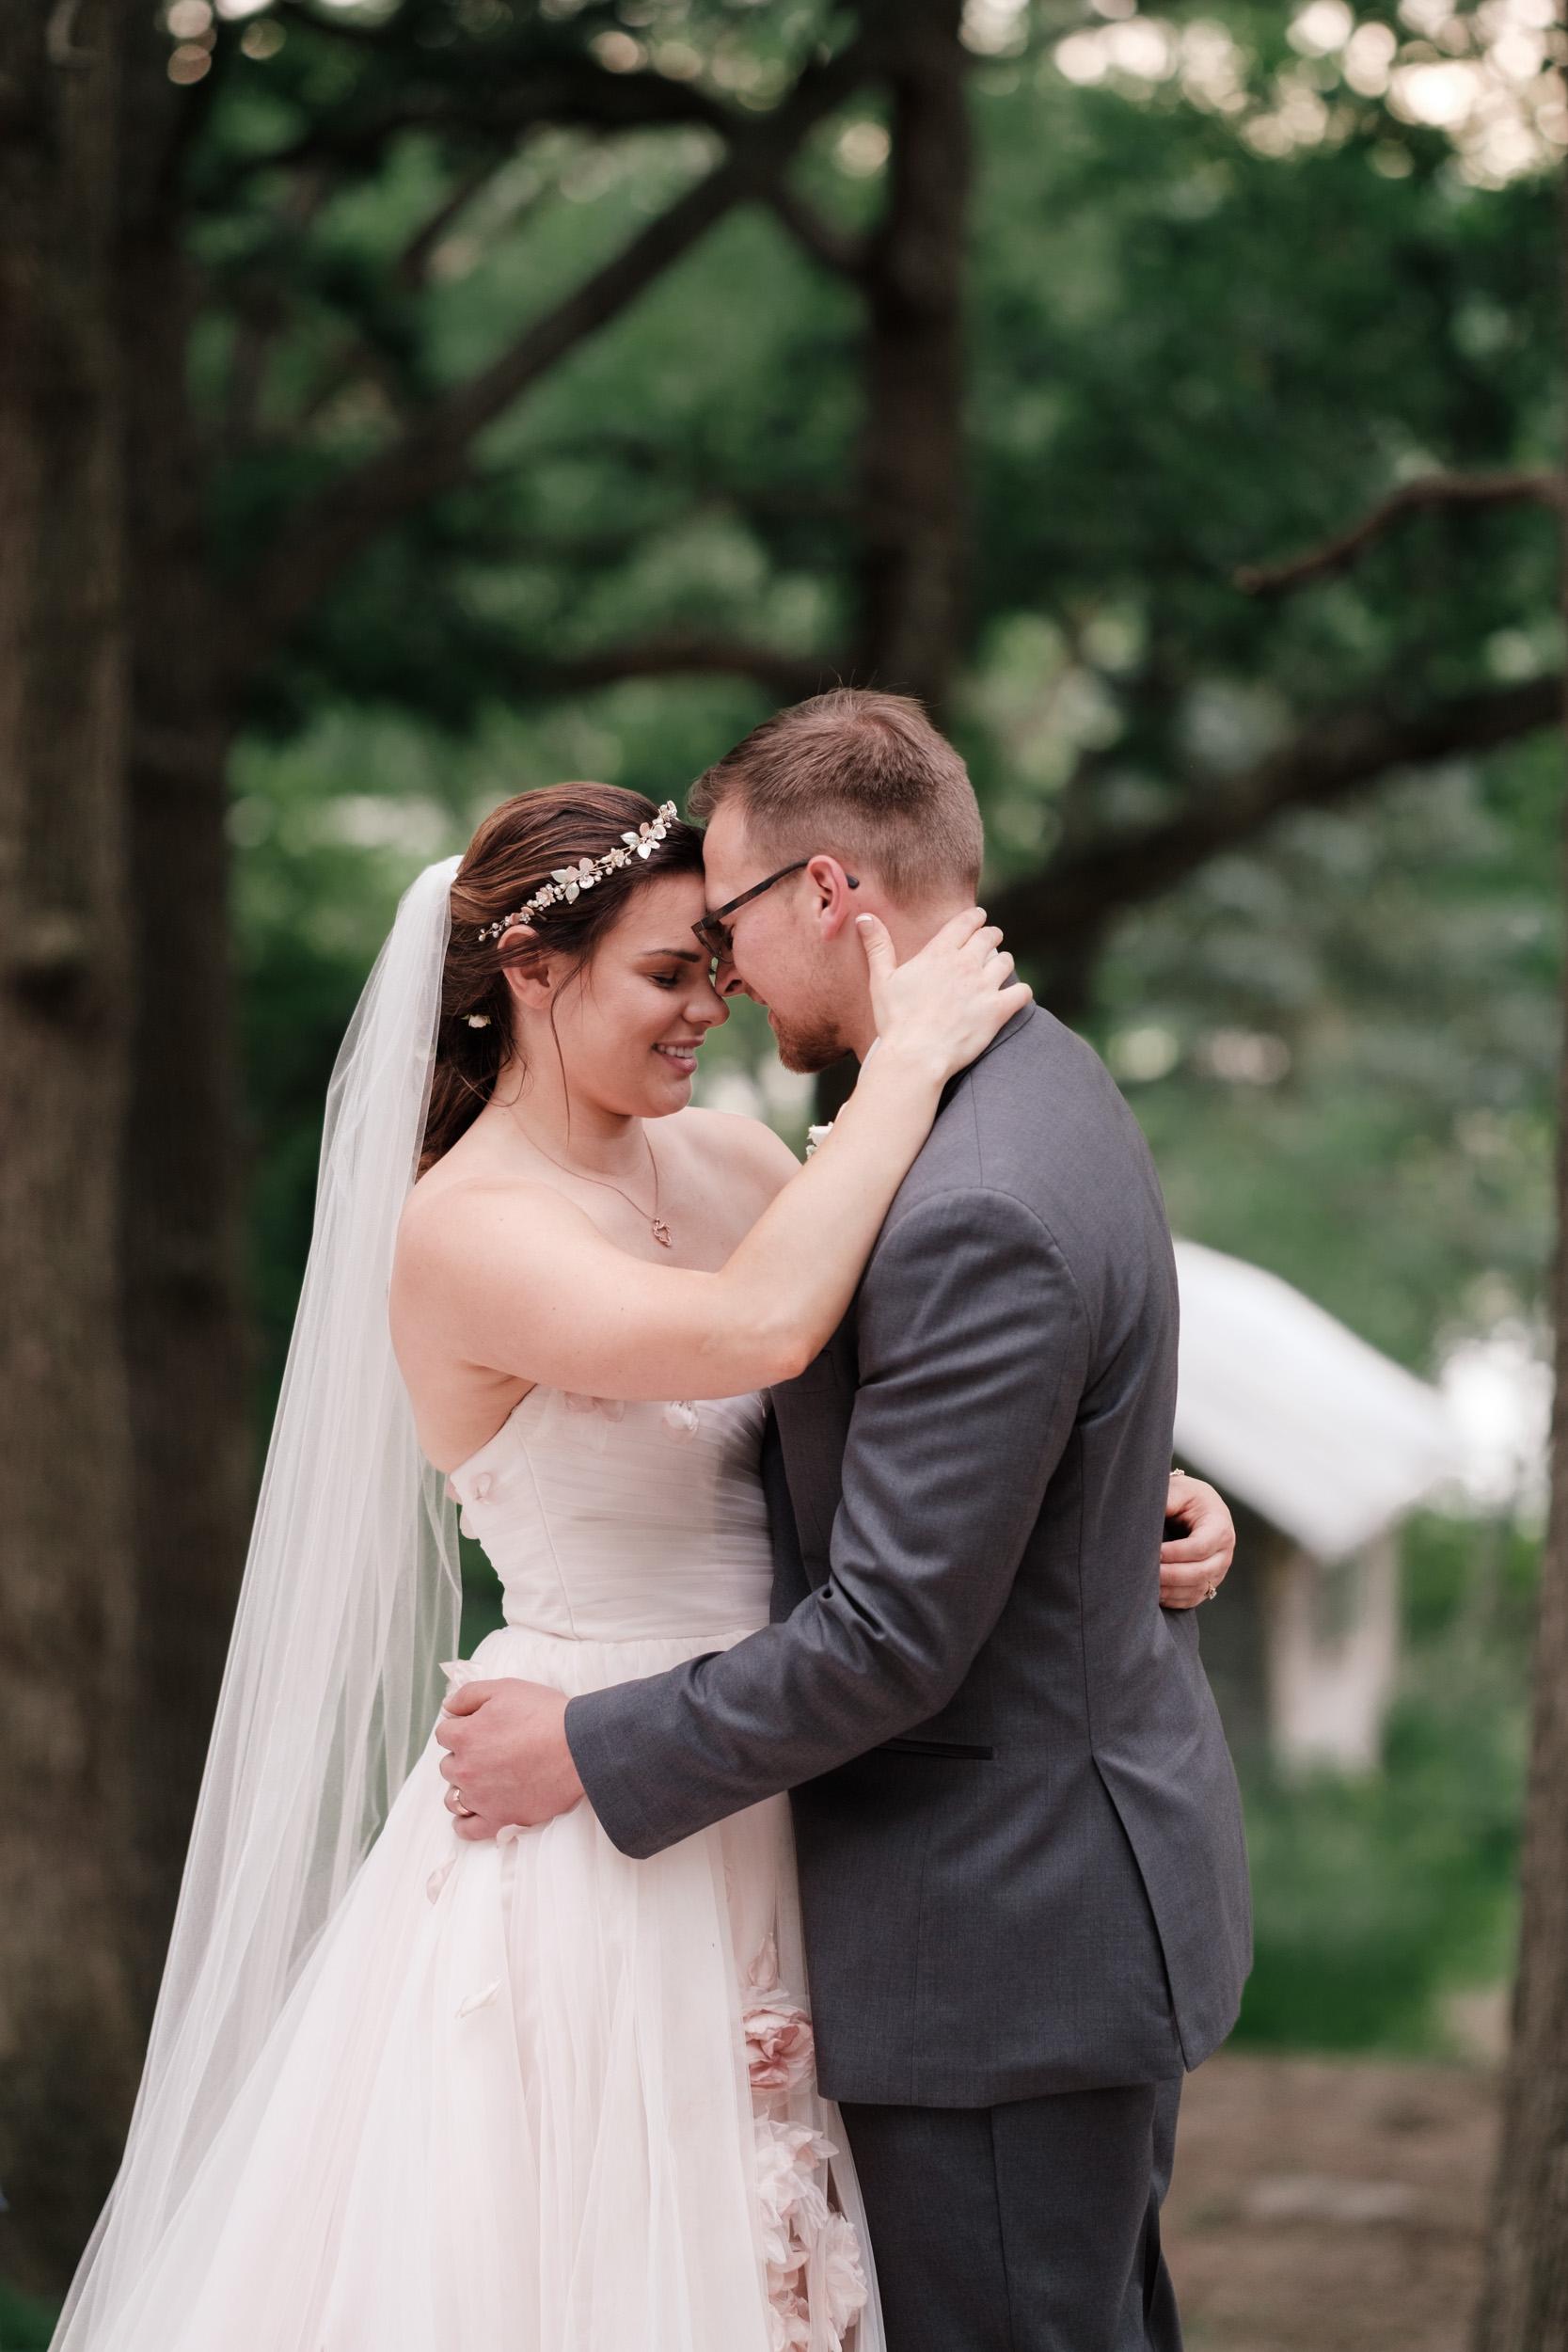 19-06-22-Ryan-Katie-The-Fields-Reserve-Wedding-42.jpg